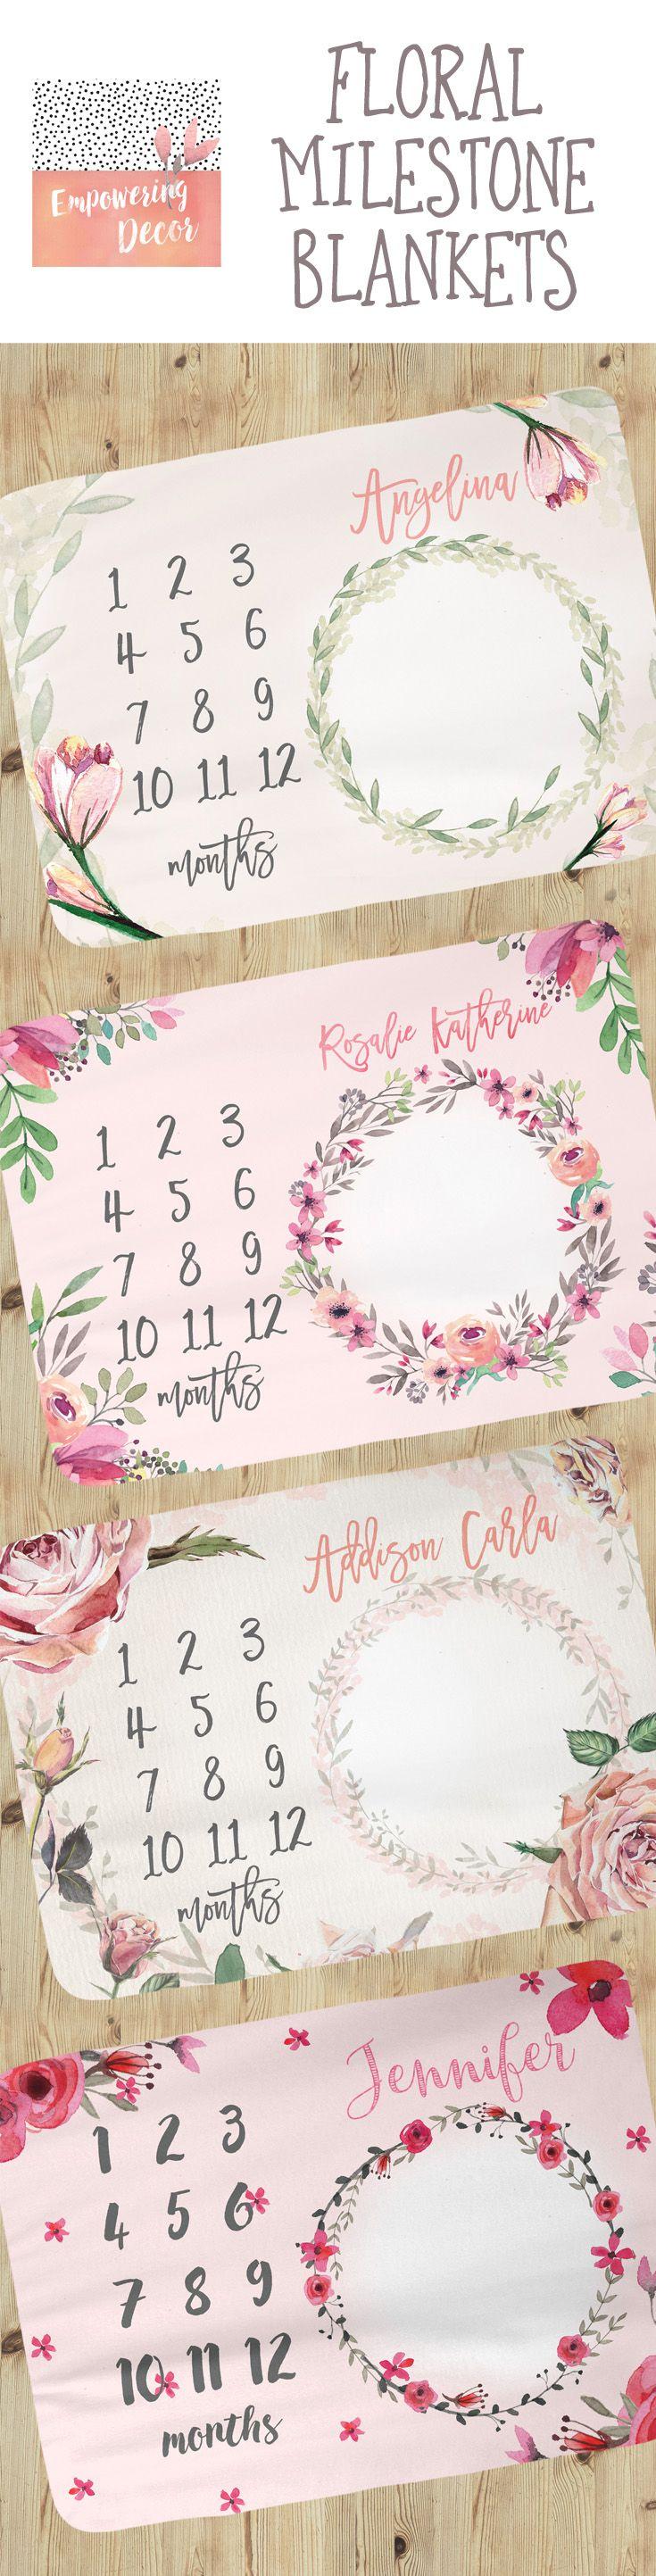 Baby Milestone Blanket - Personalized Baby Blanket - Floral Baby Milestone Blanket - Baby Blanket - Calendar Photo Prop - Baby Girl blanket